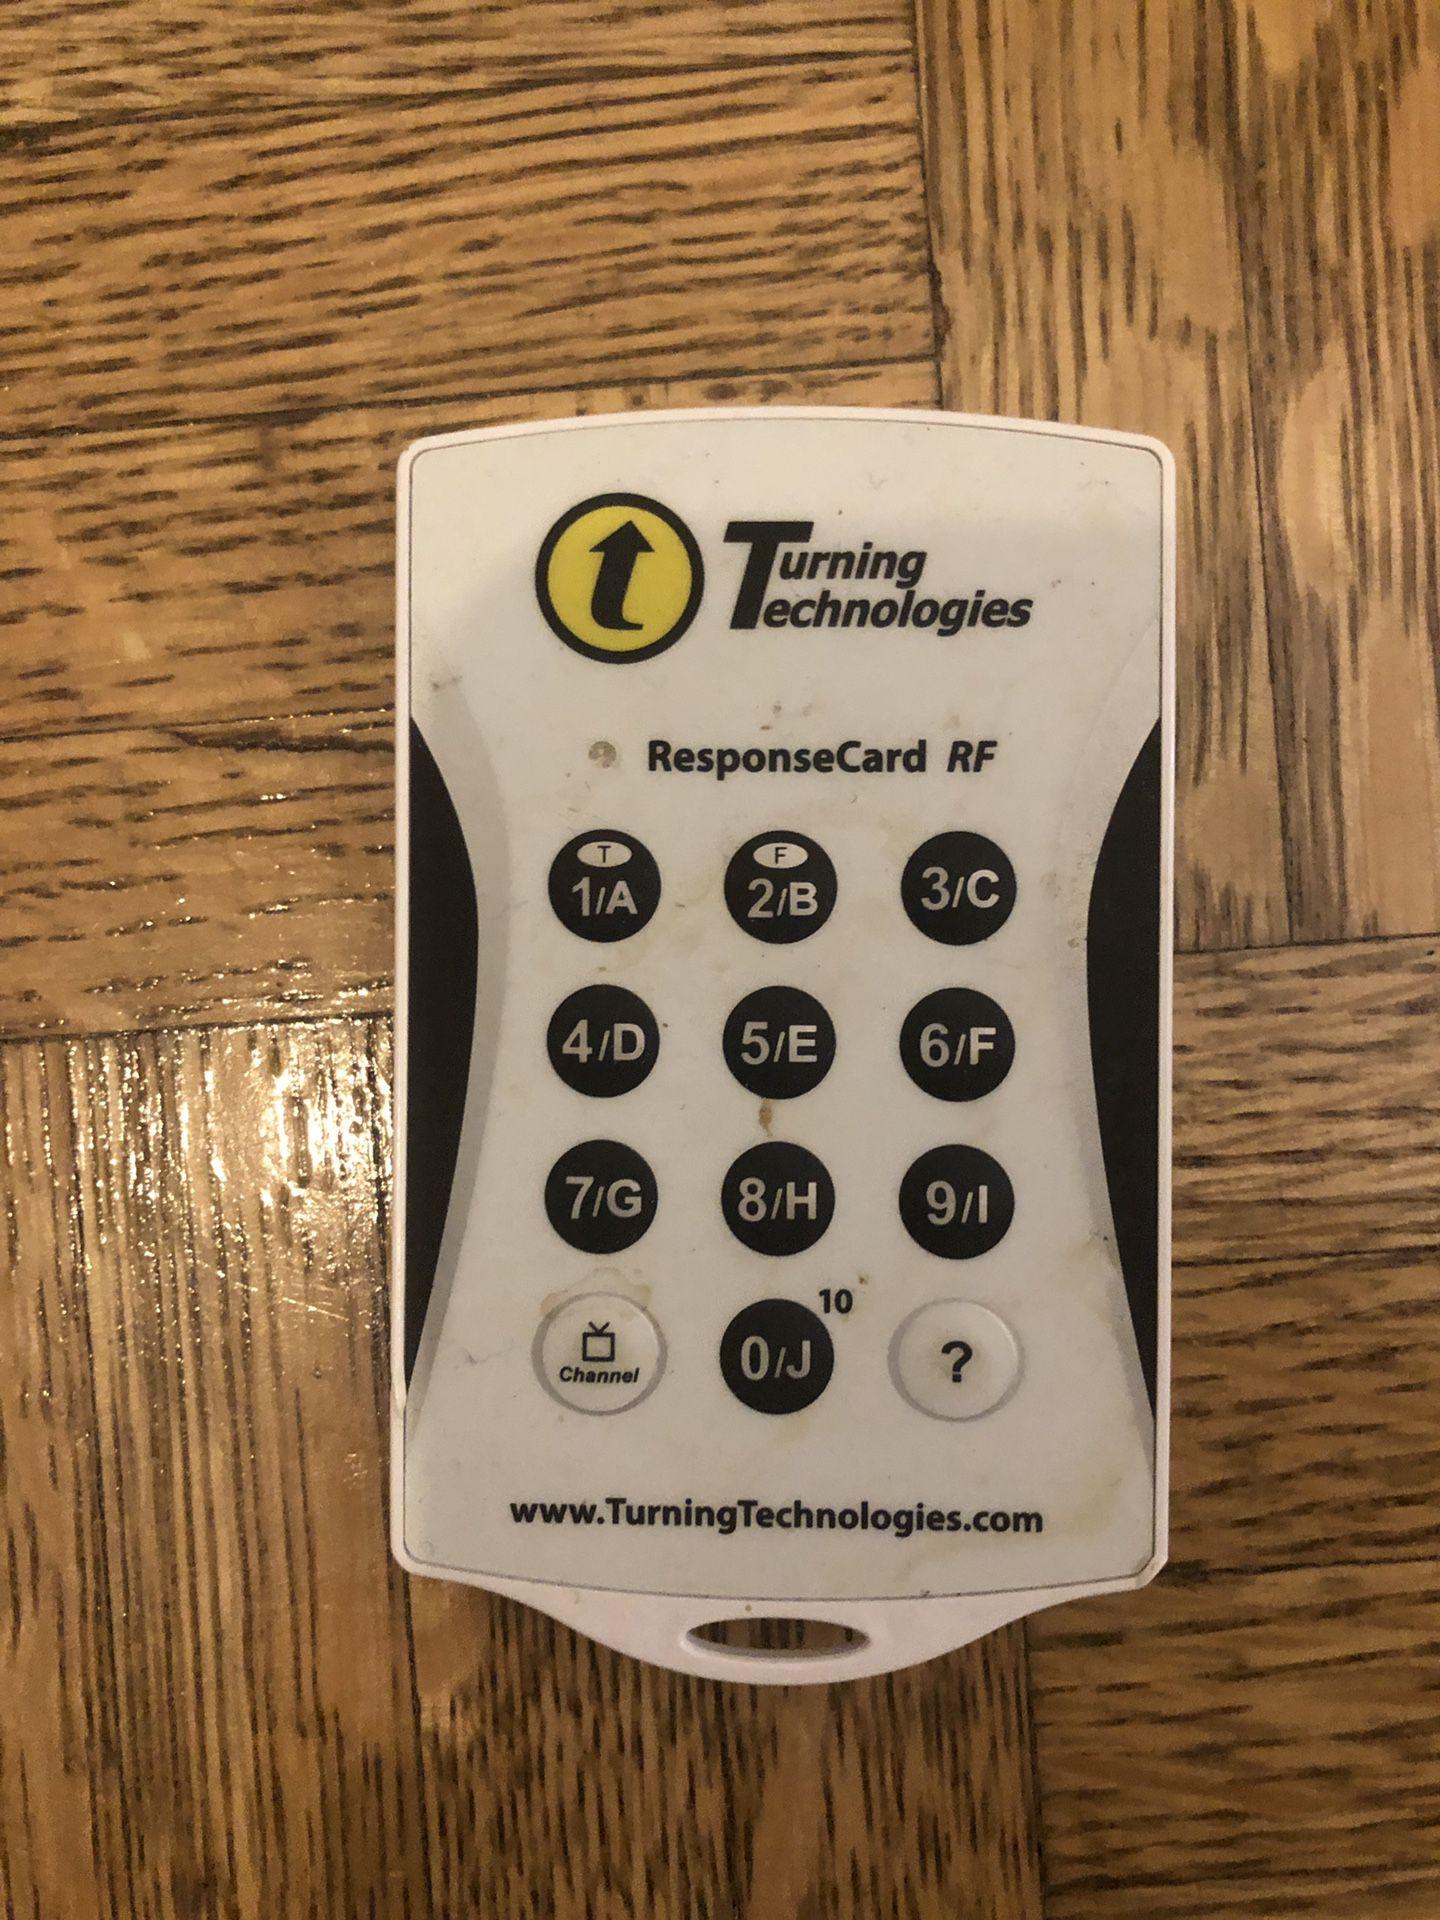 Turning technologies ResponseCard